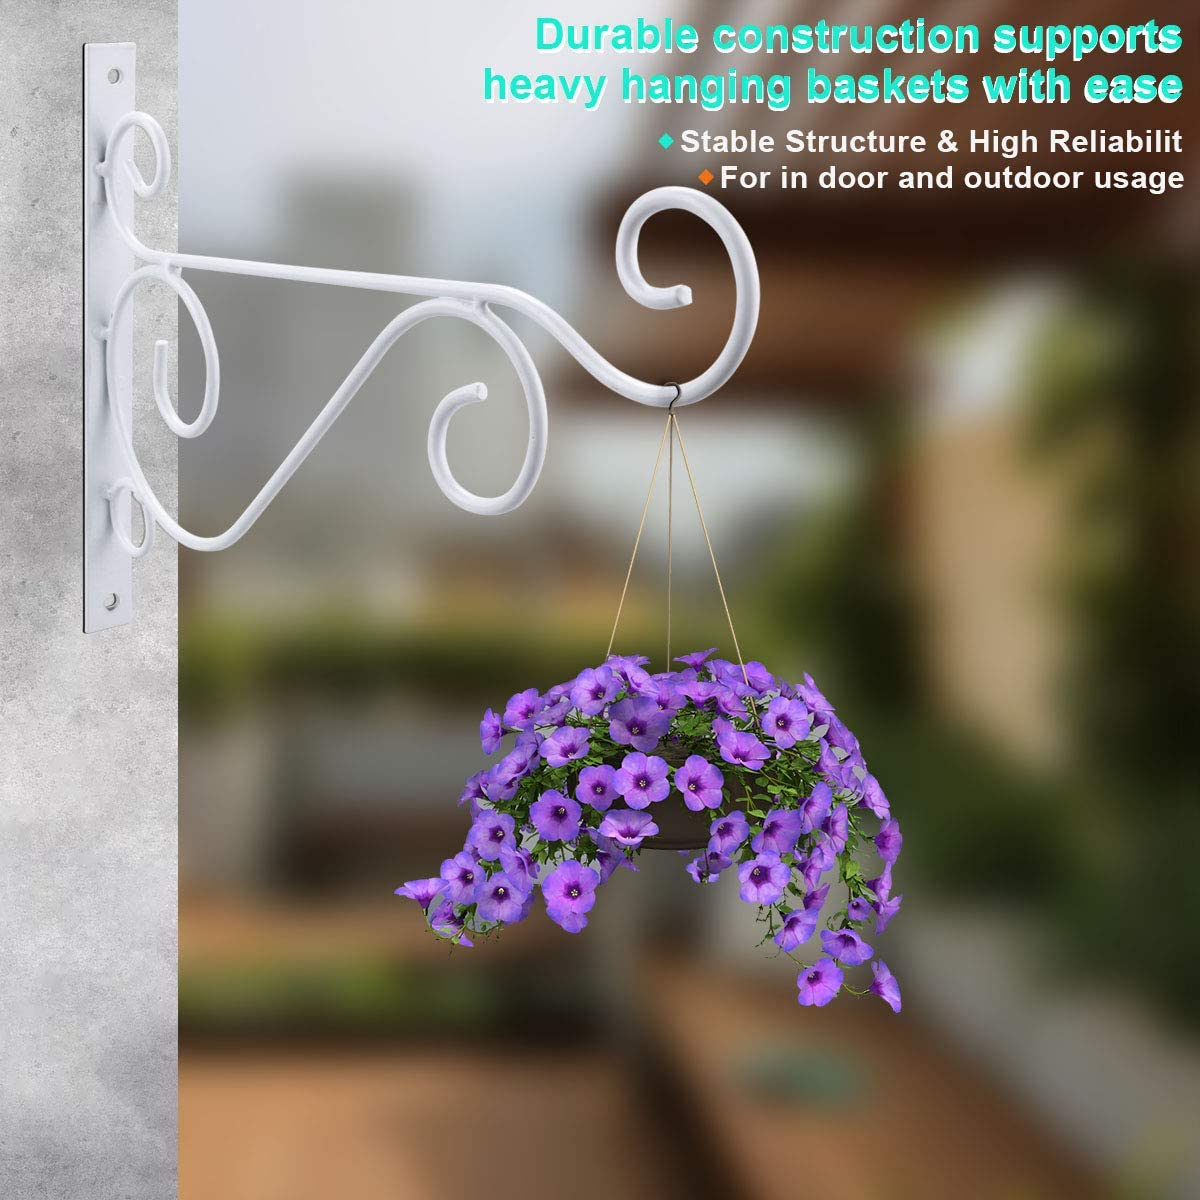 White T6 Pack of 4 Wall Hanging Brackets Hooks with Screws for Garden Basket Lantern Lawn Light Flower Pots Plant Hanger Gardening Decoration 25x20CM